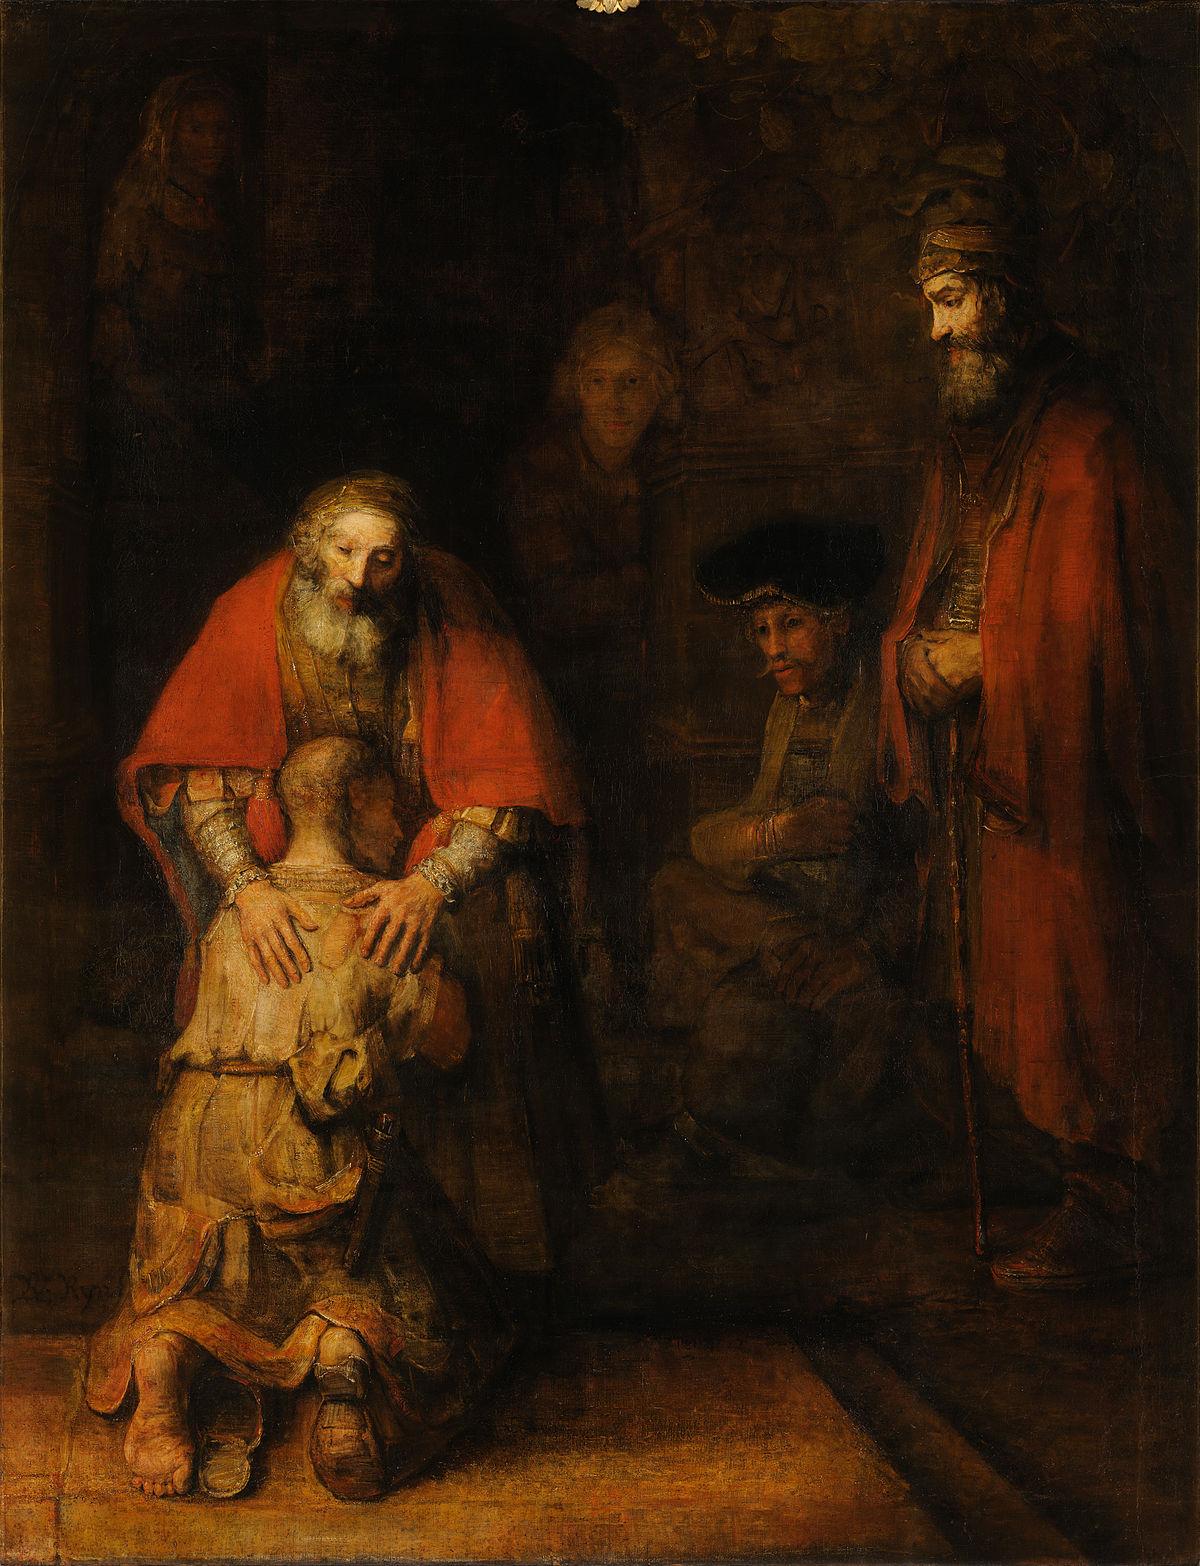 1200px-Rembrandt_Harmensz_van_Rijn_-_Return_of_the_Prodigal_Son_-_Google_Art_Project.jpg